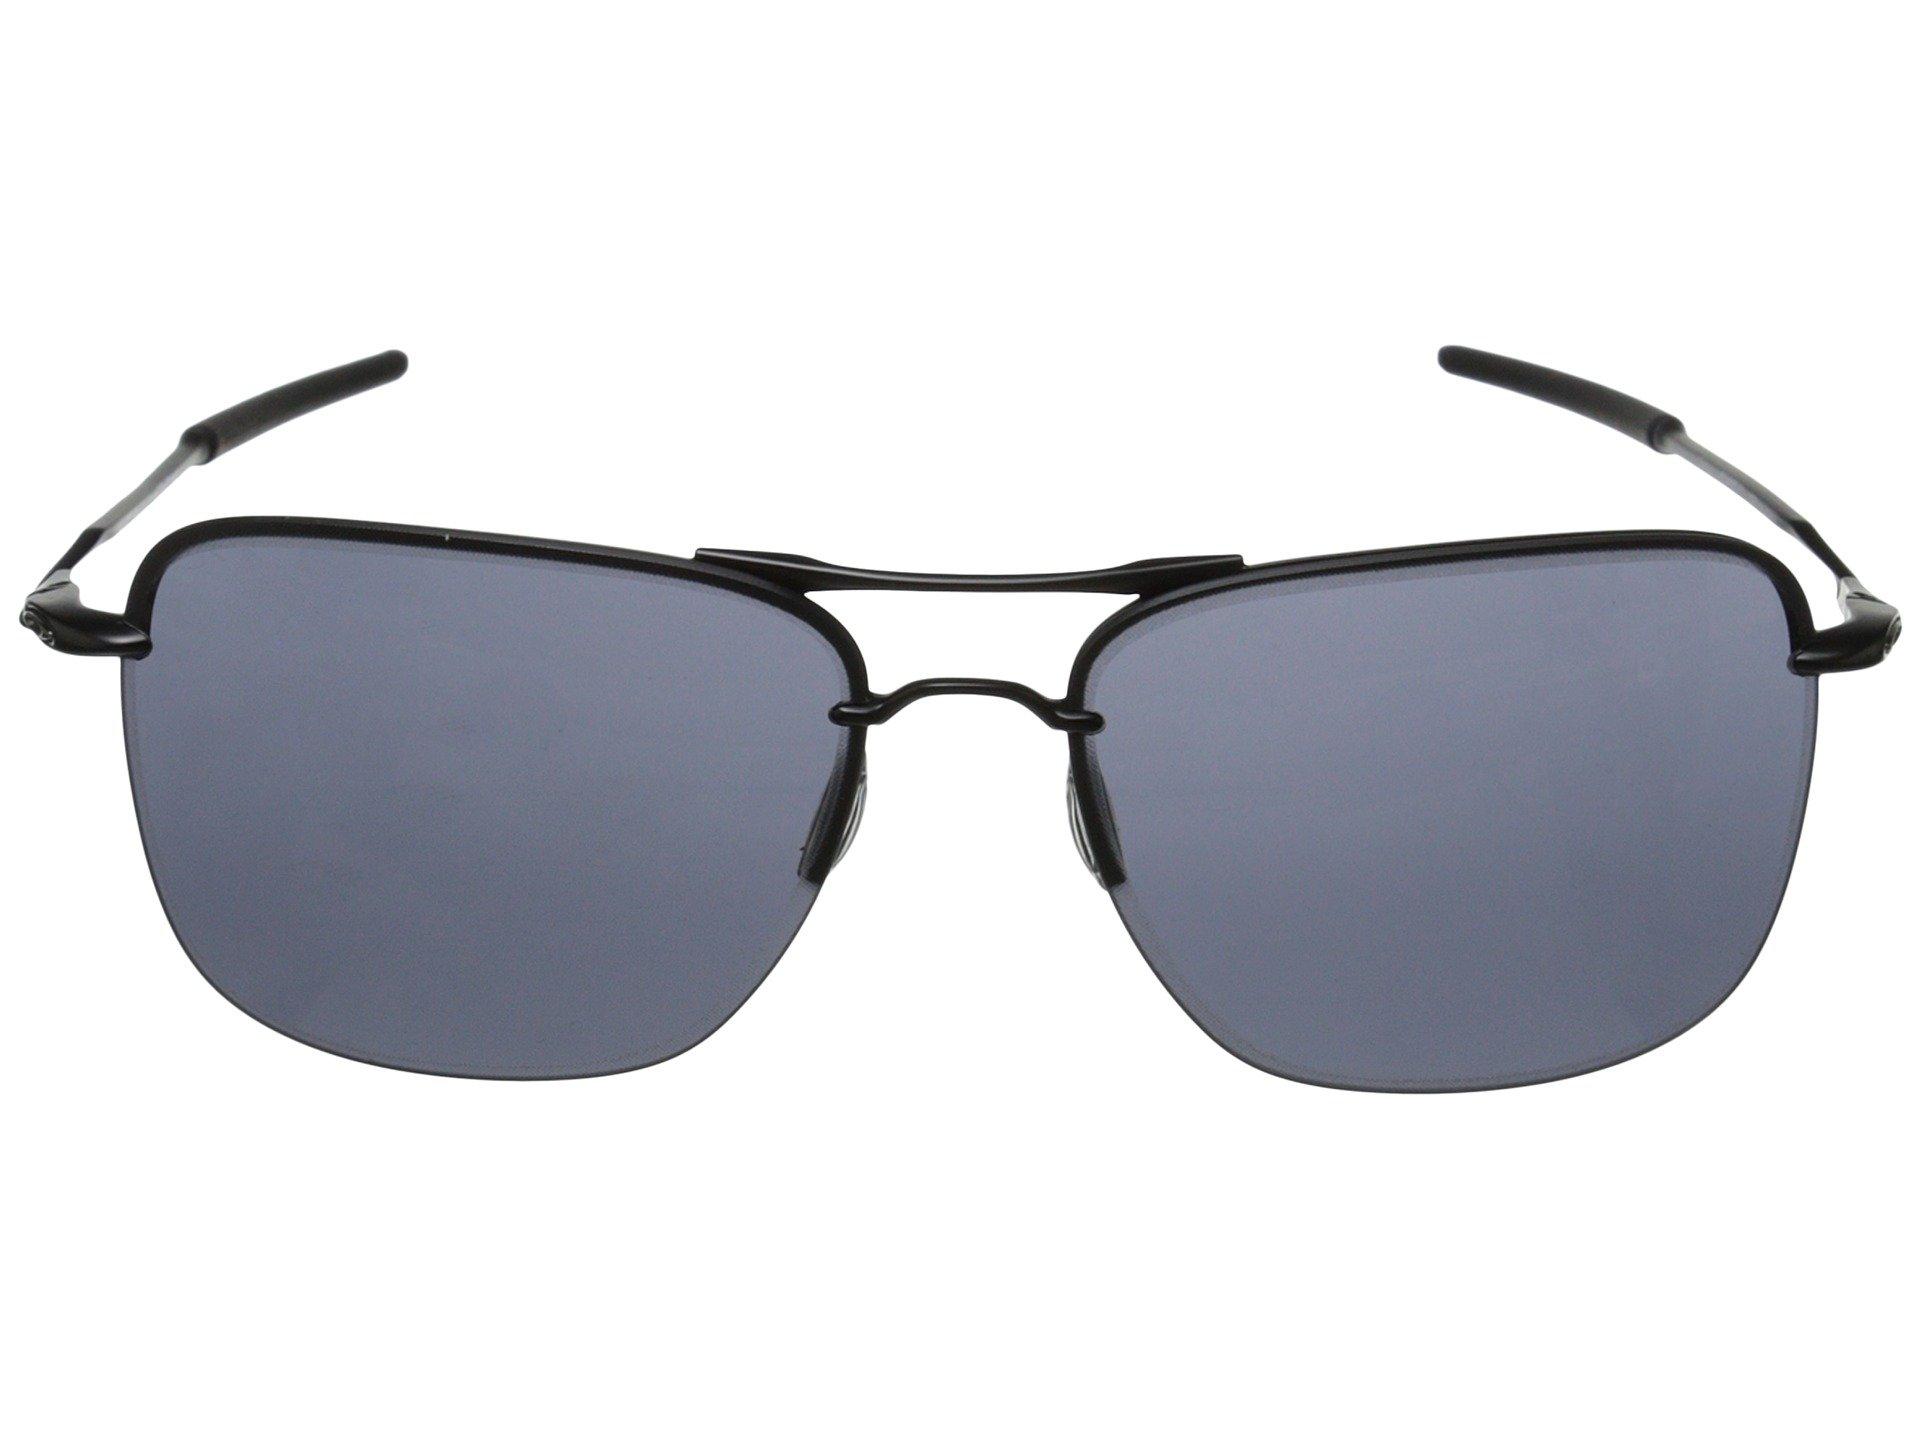 5c2ccf6217 Oakley Wire Frame Sunglasses Tailhook « Heritage Malta